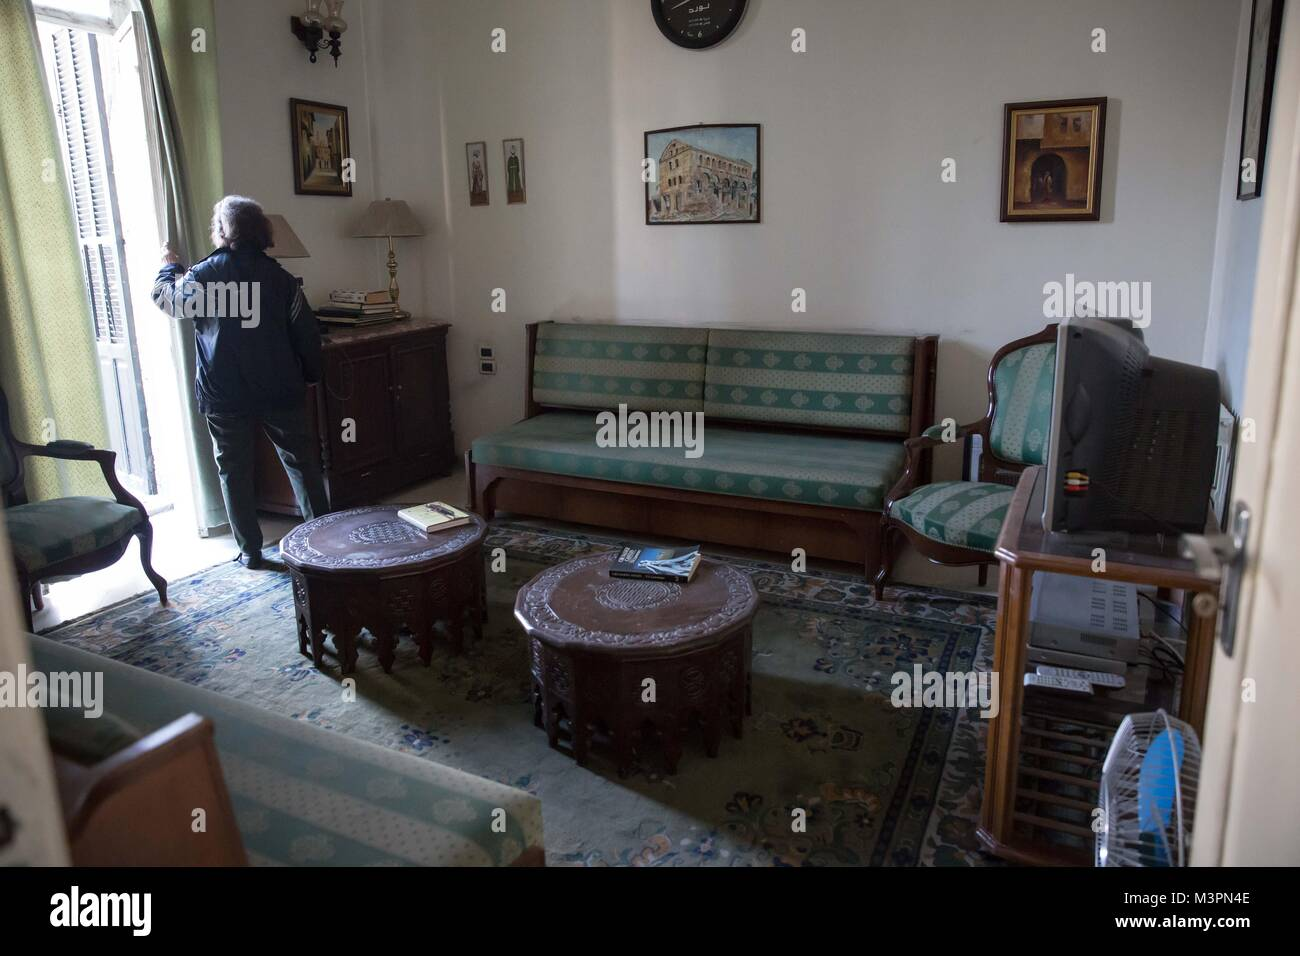 Aleppo, Syria. 2nd Nov, 2017. Rubina Tashjian, the widow of the last owner of Aleppo's Baron Hotel, opens the - Stock Image